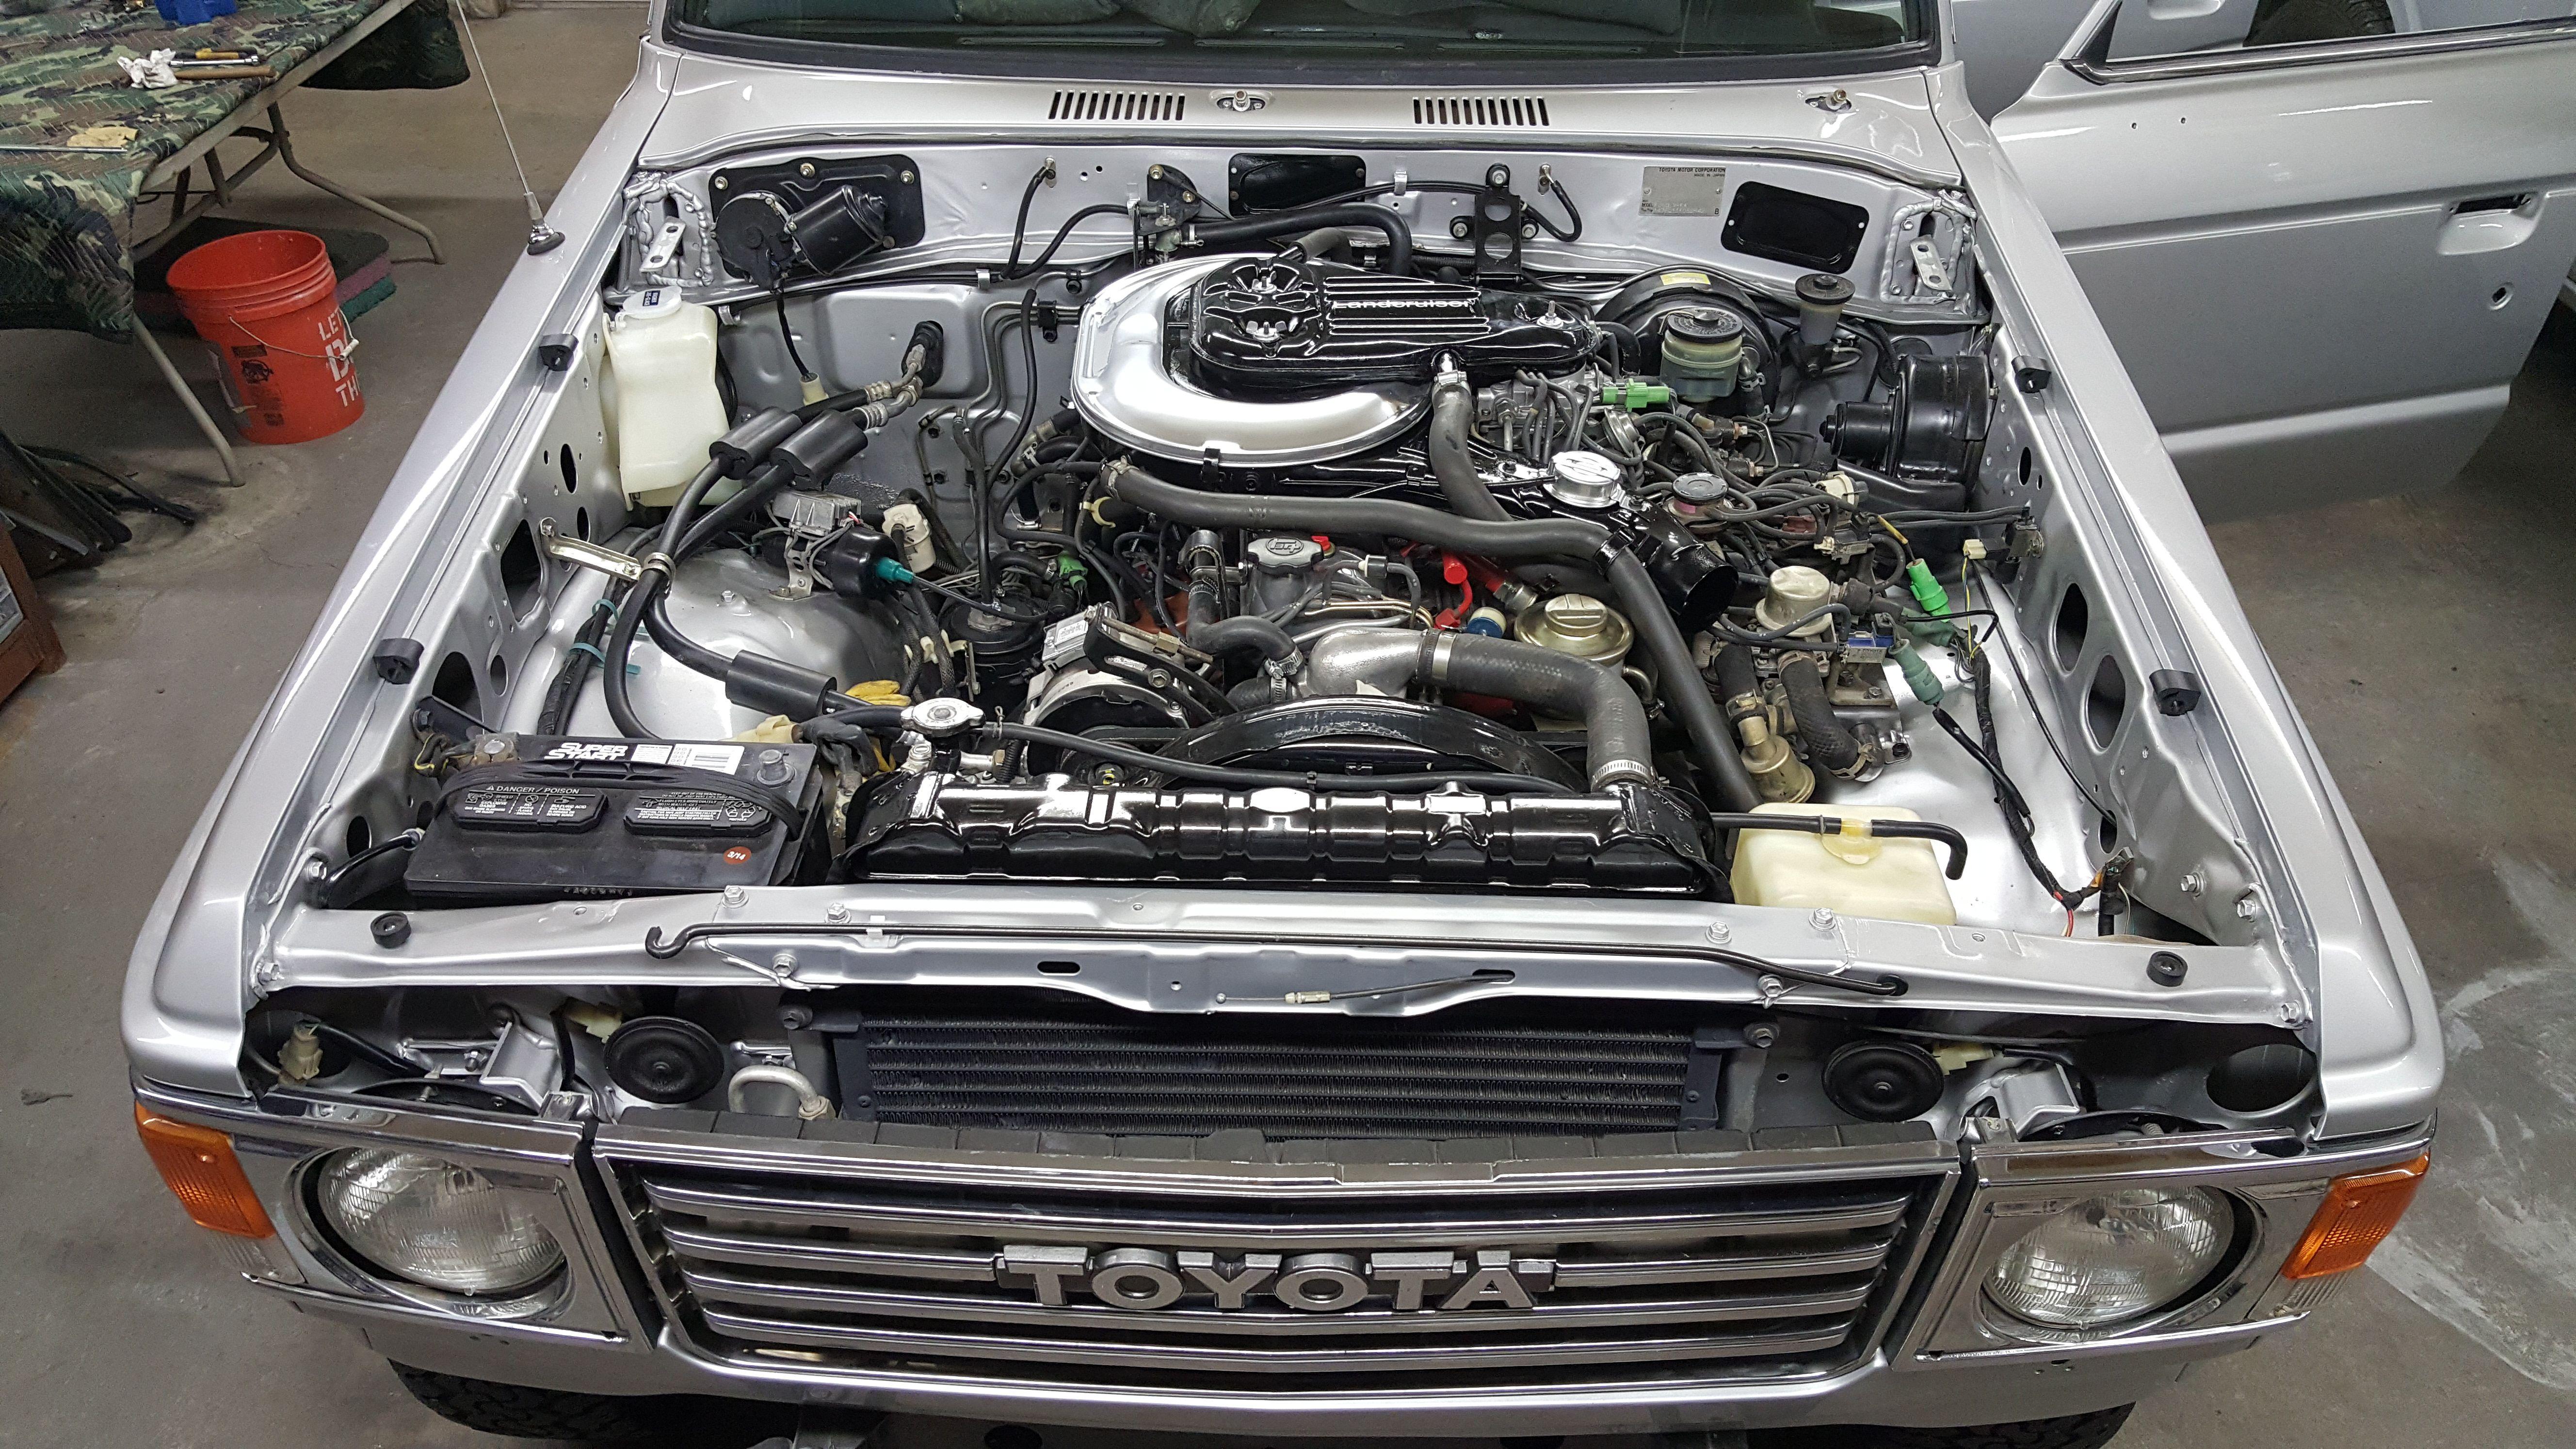 「Toyota」おしゃれまとめの人気アイデア|Pinterest|Britain Allenbaugh ランクル60